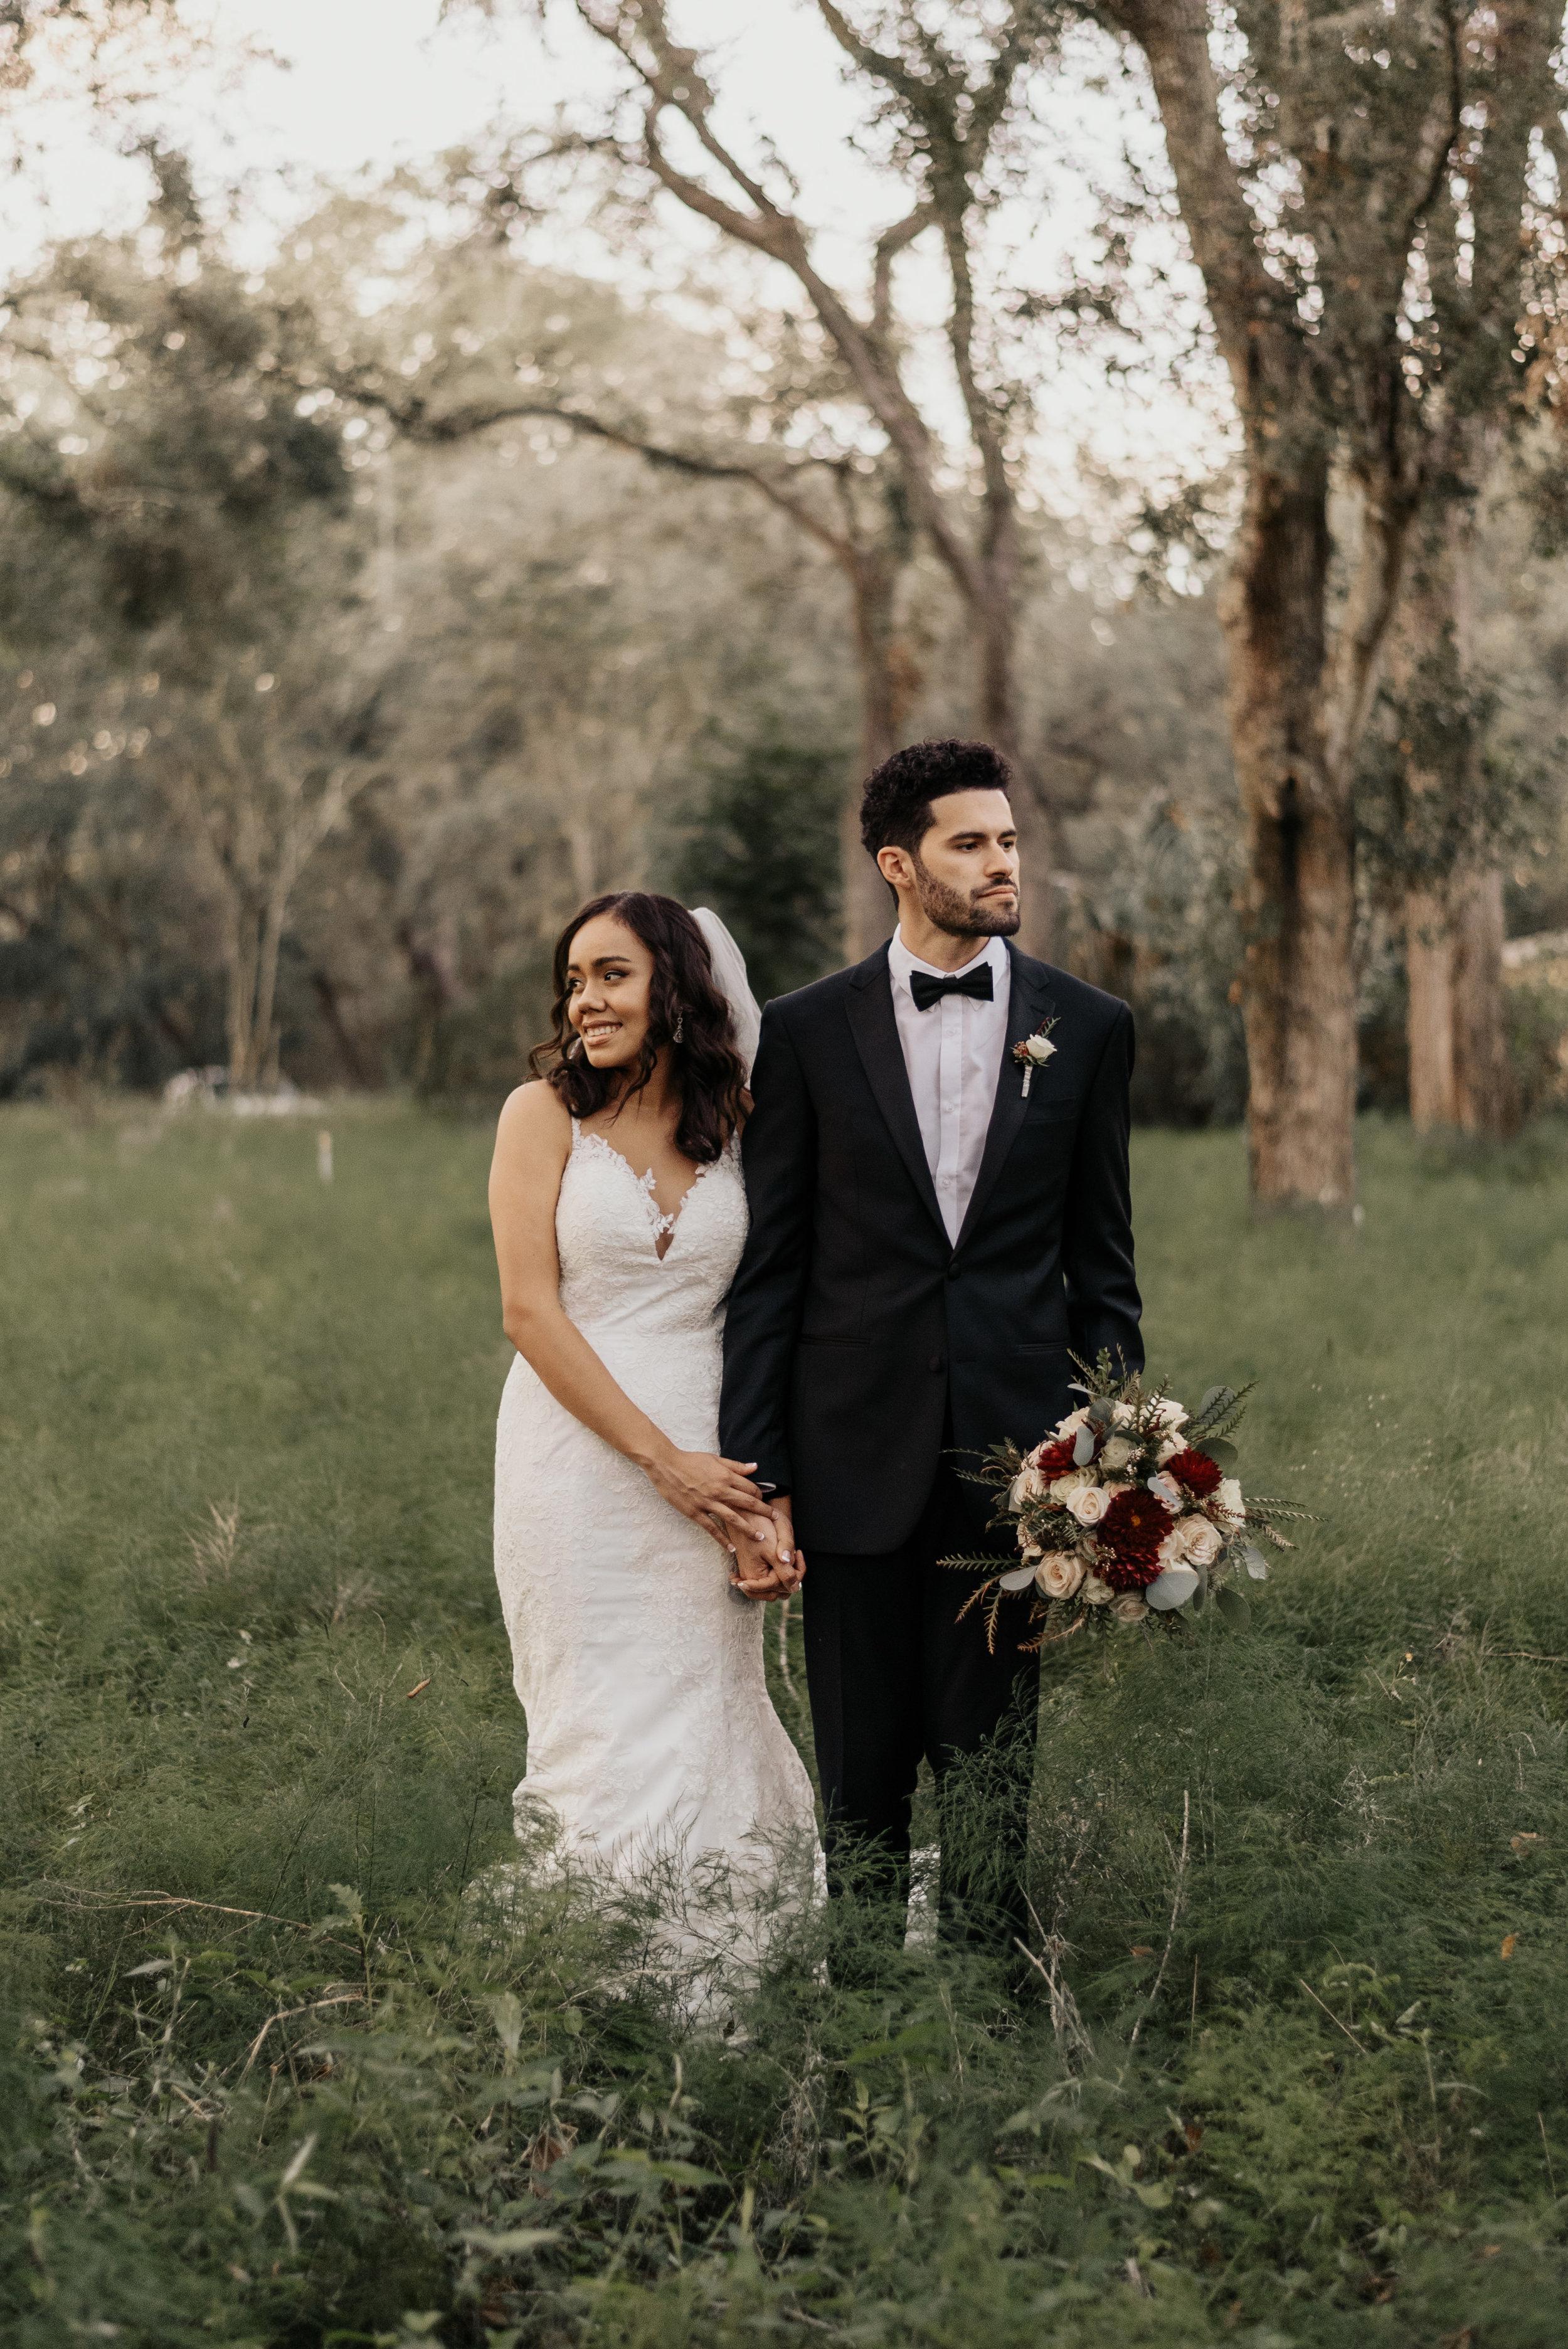 Kirstie-AJ-Wedding-9049.jpg